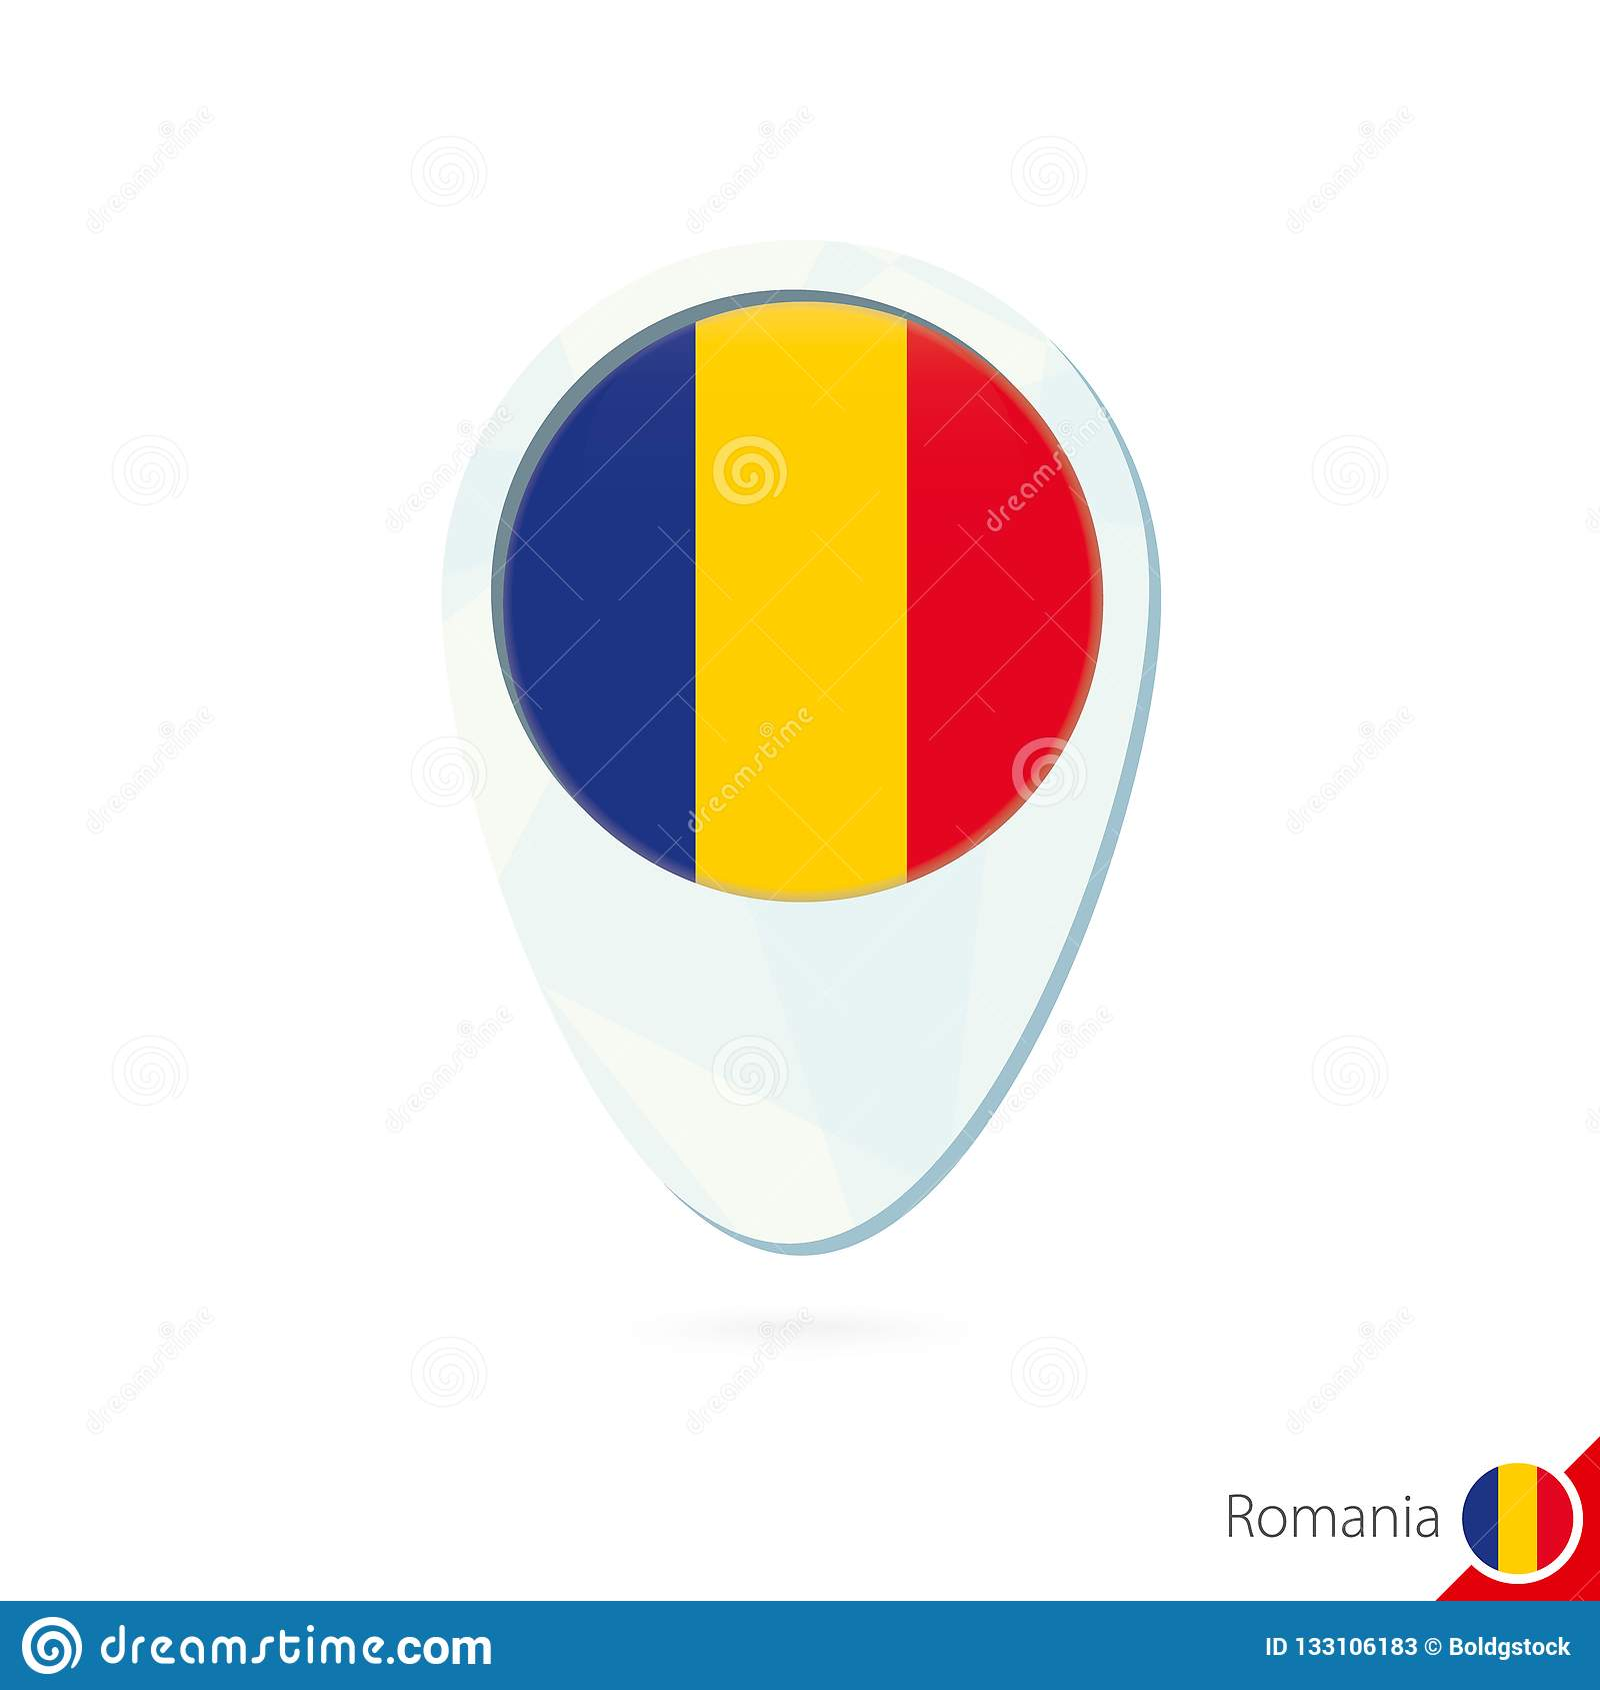 Romania Flag Location Map Pin Icon On White Background Stock ...